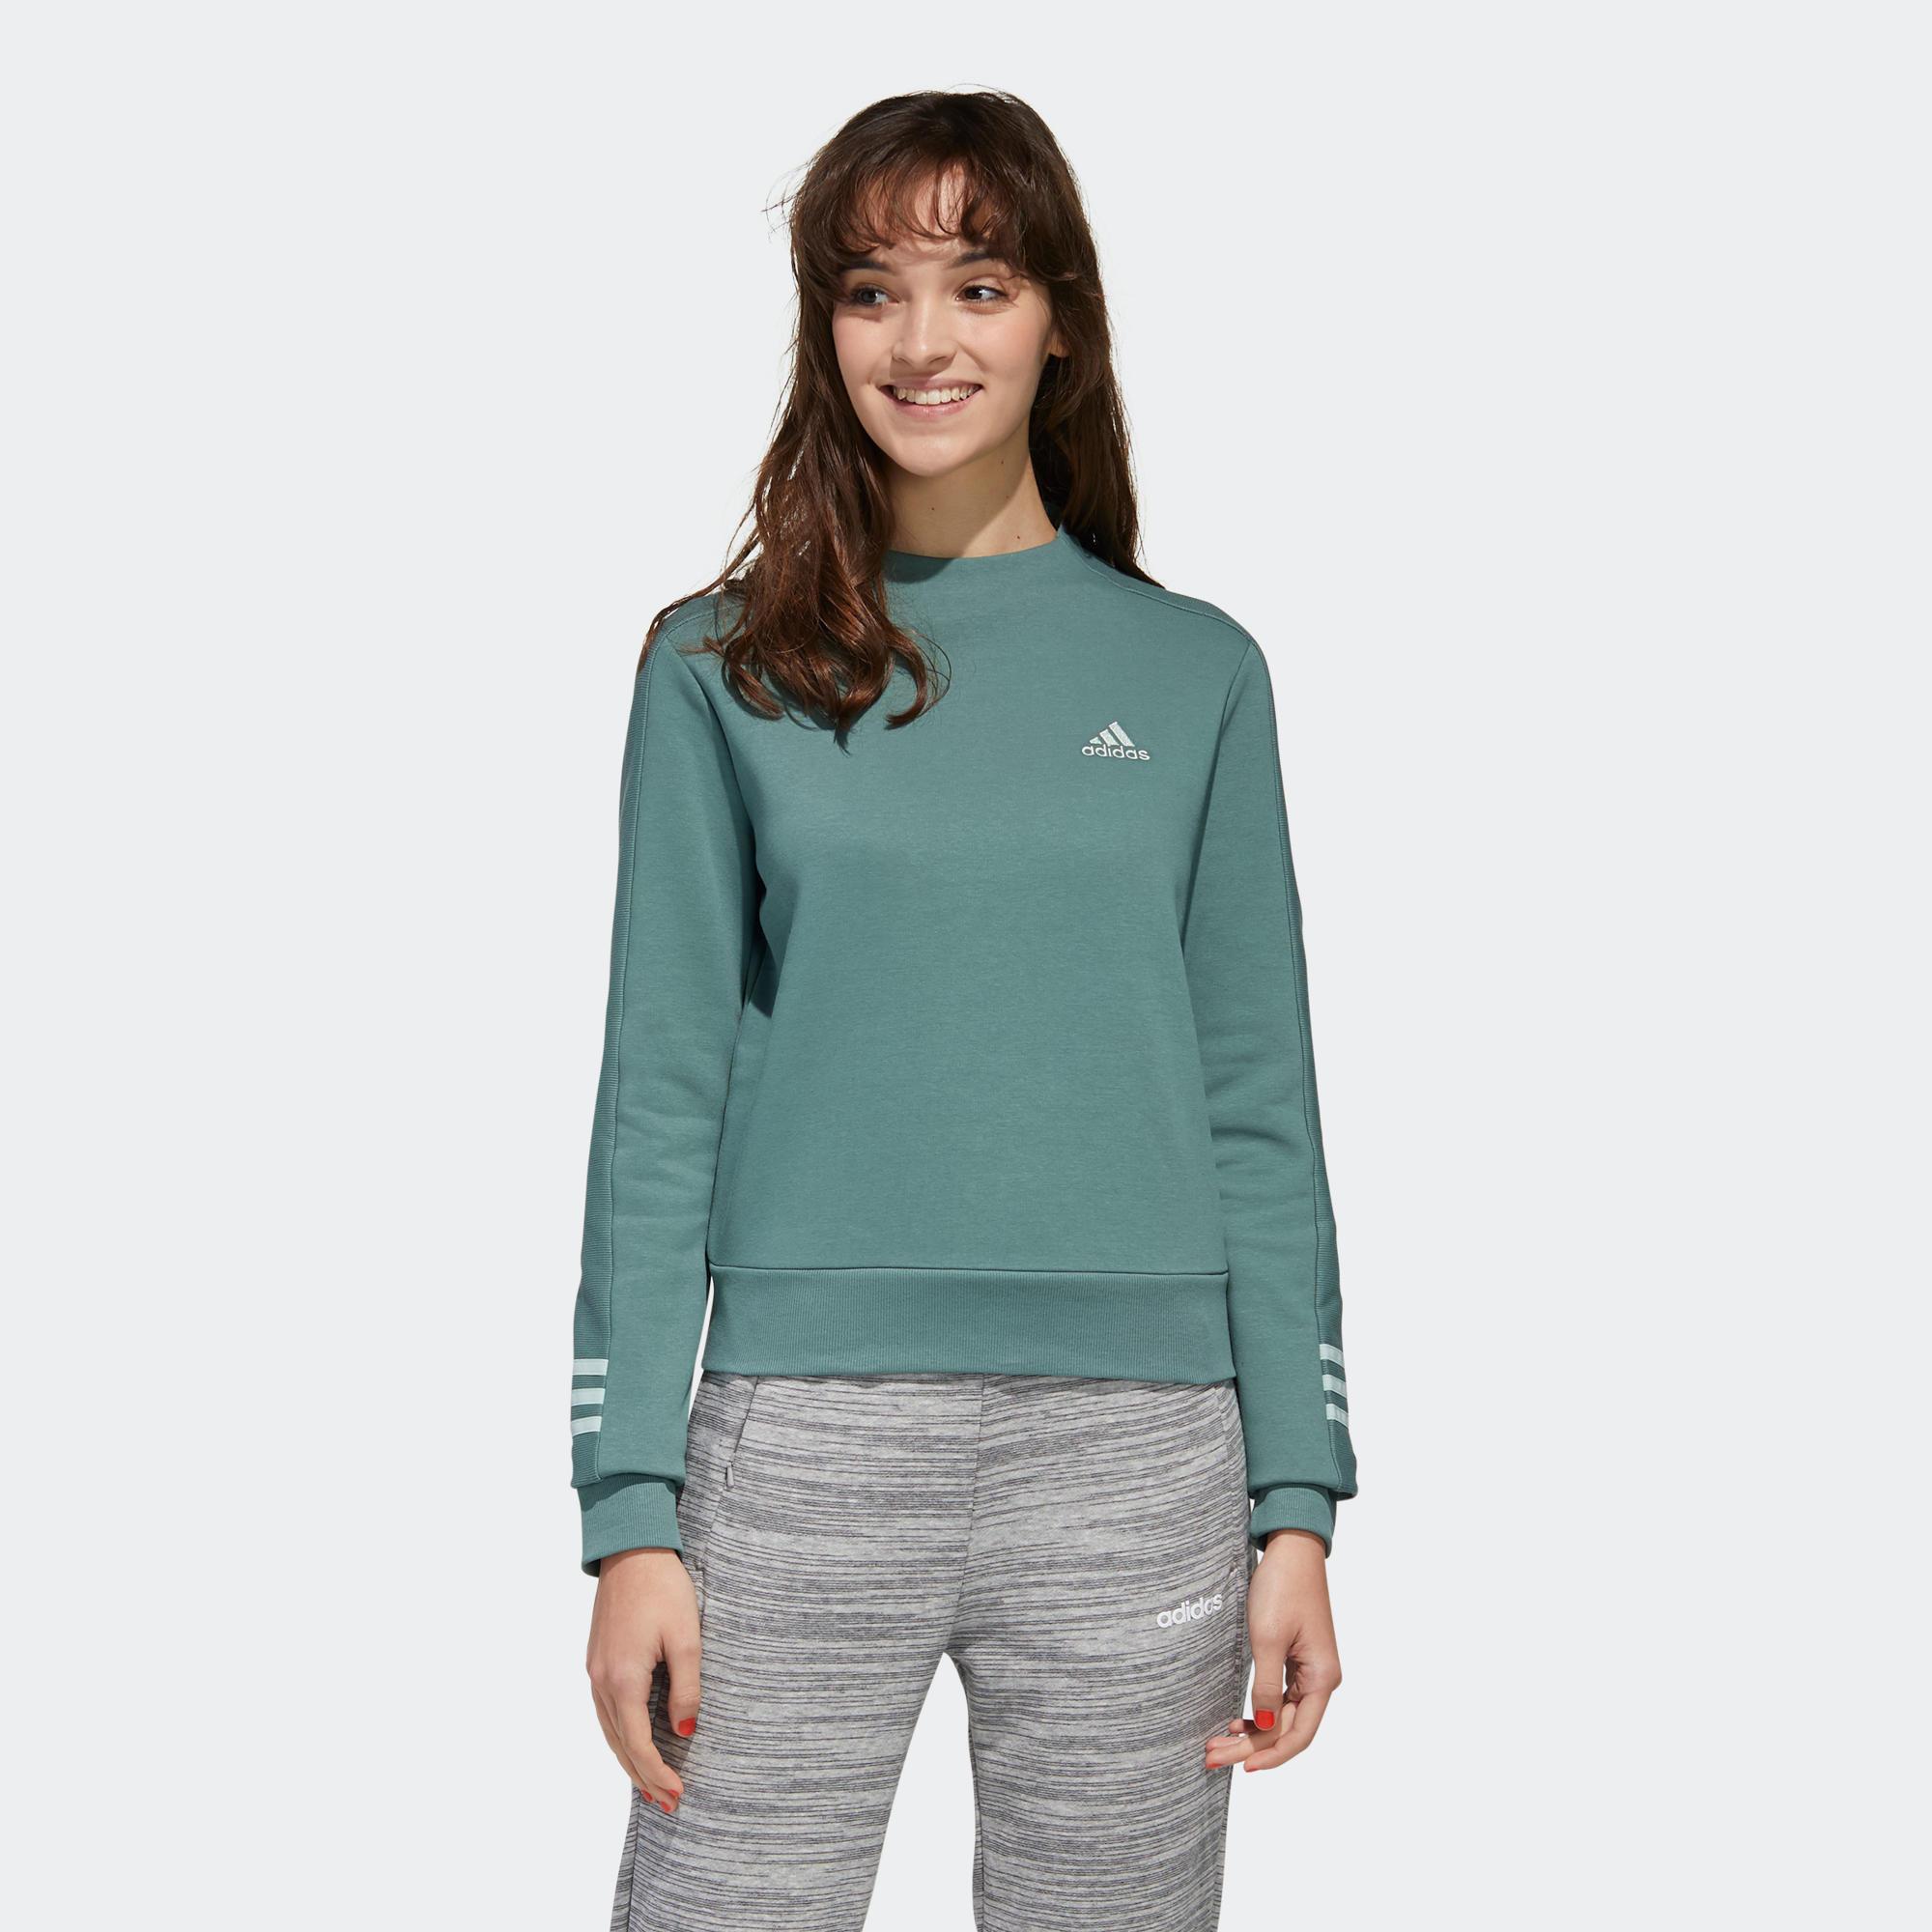 apasionado Ruina Dar  Sudadera deportiva Adidas mujer verde ADIDAS | Decathlon